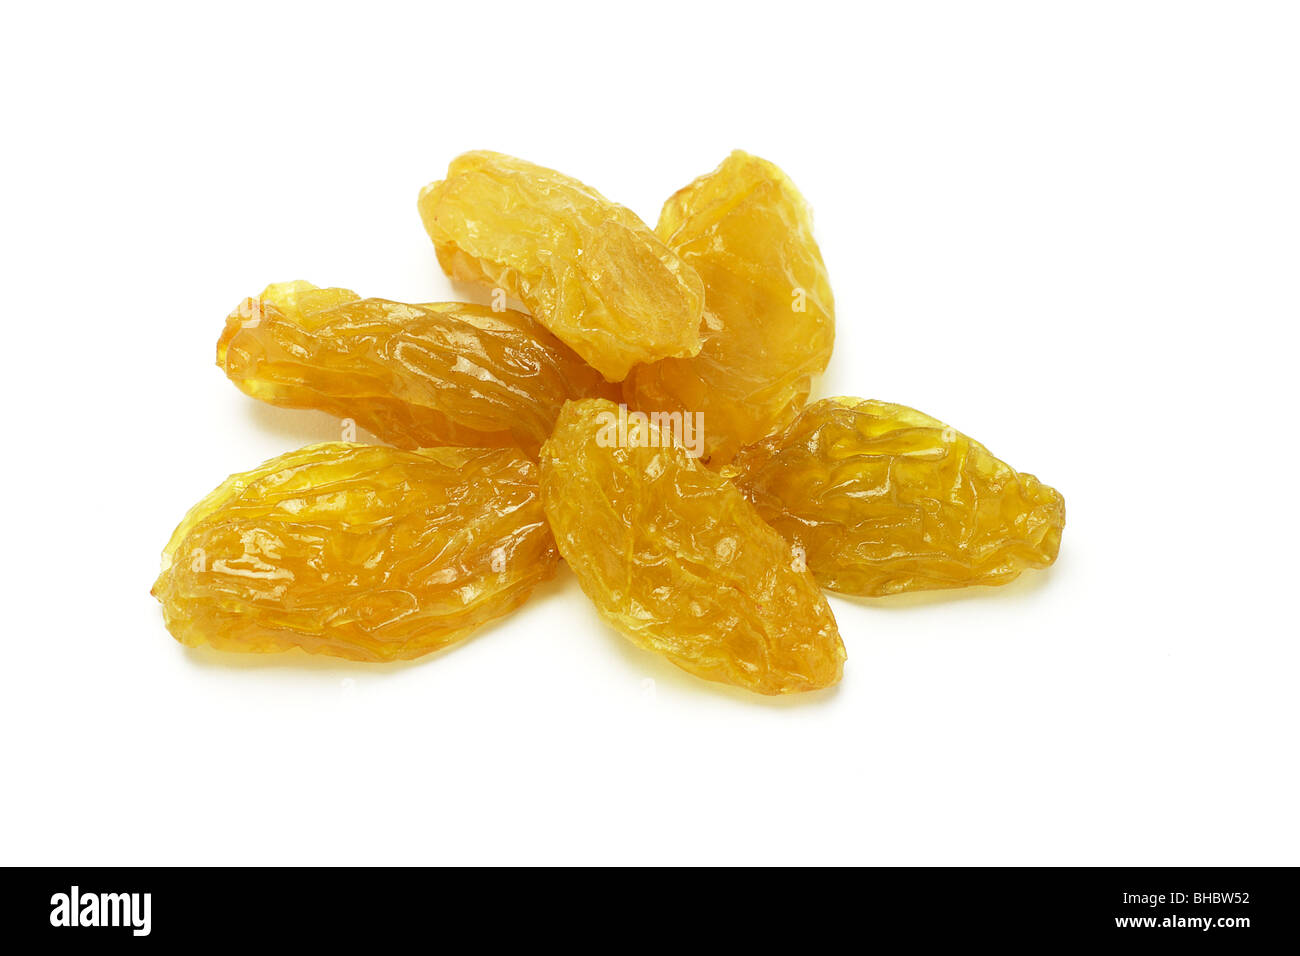 Golden jumbo size raisins on white background - Stock Image